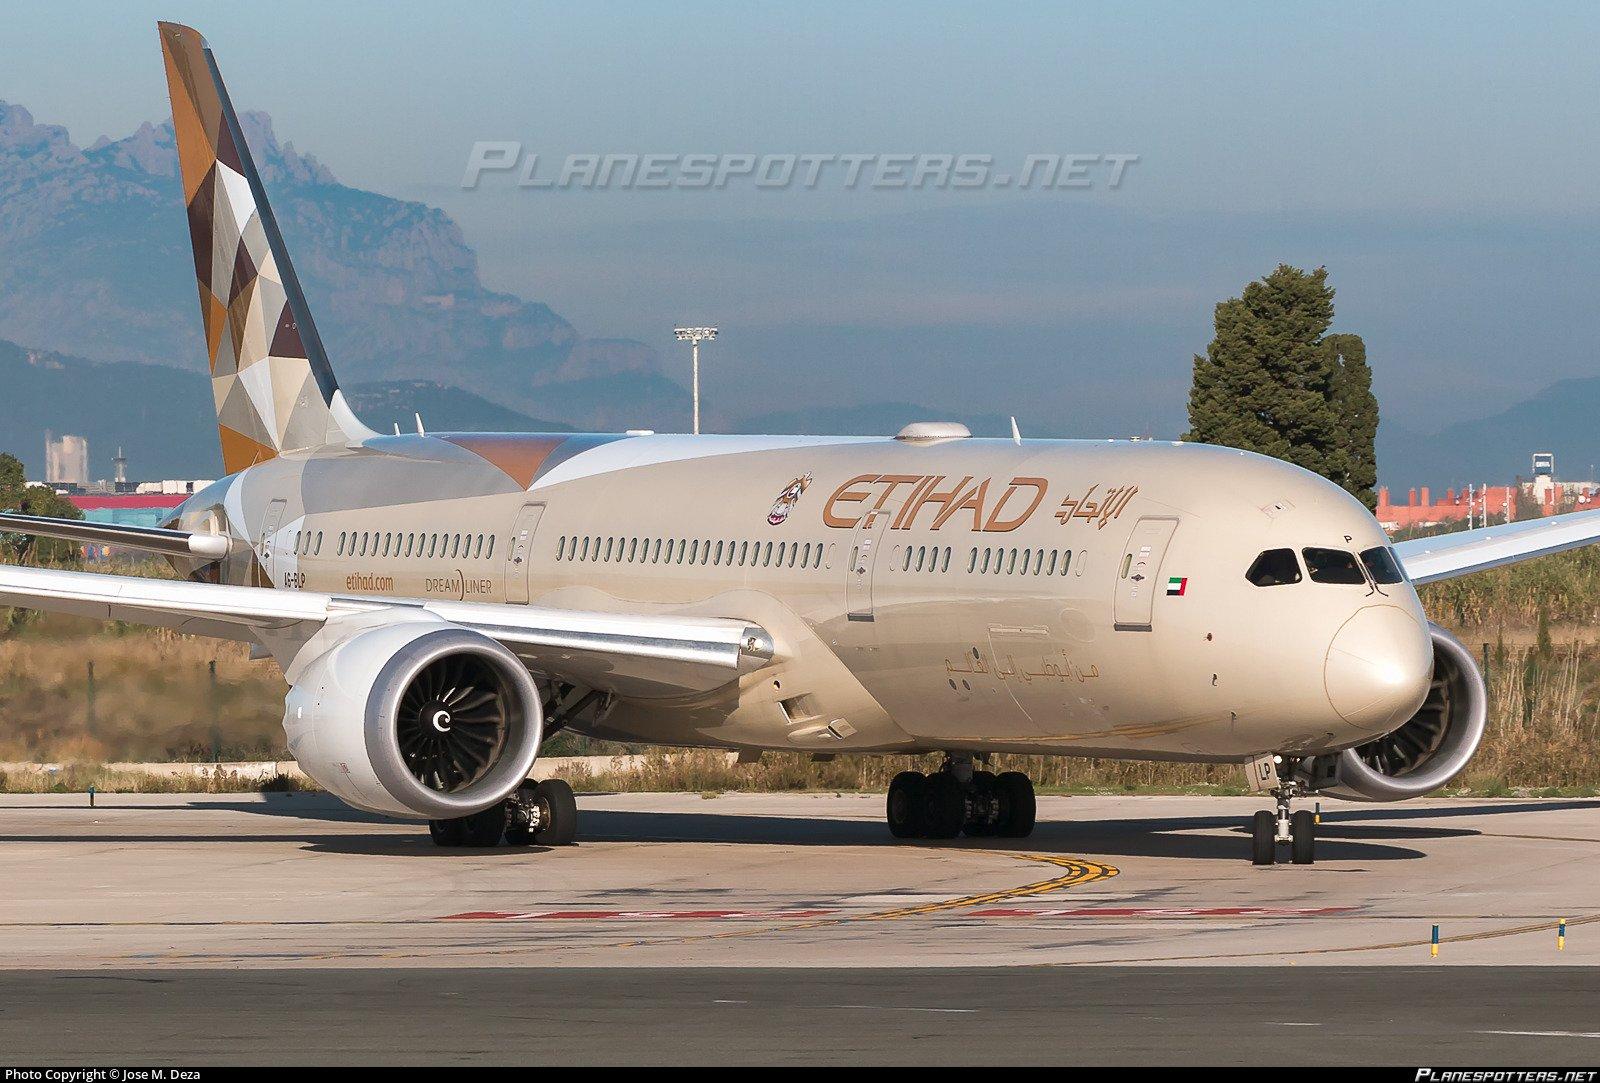 Vols avec Etihad Airways au départ d'Abu Dhabi